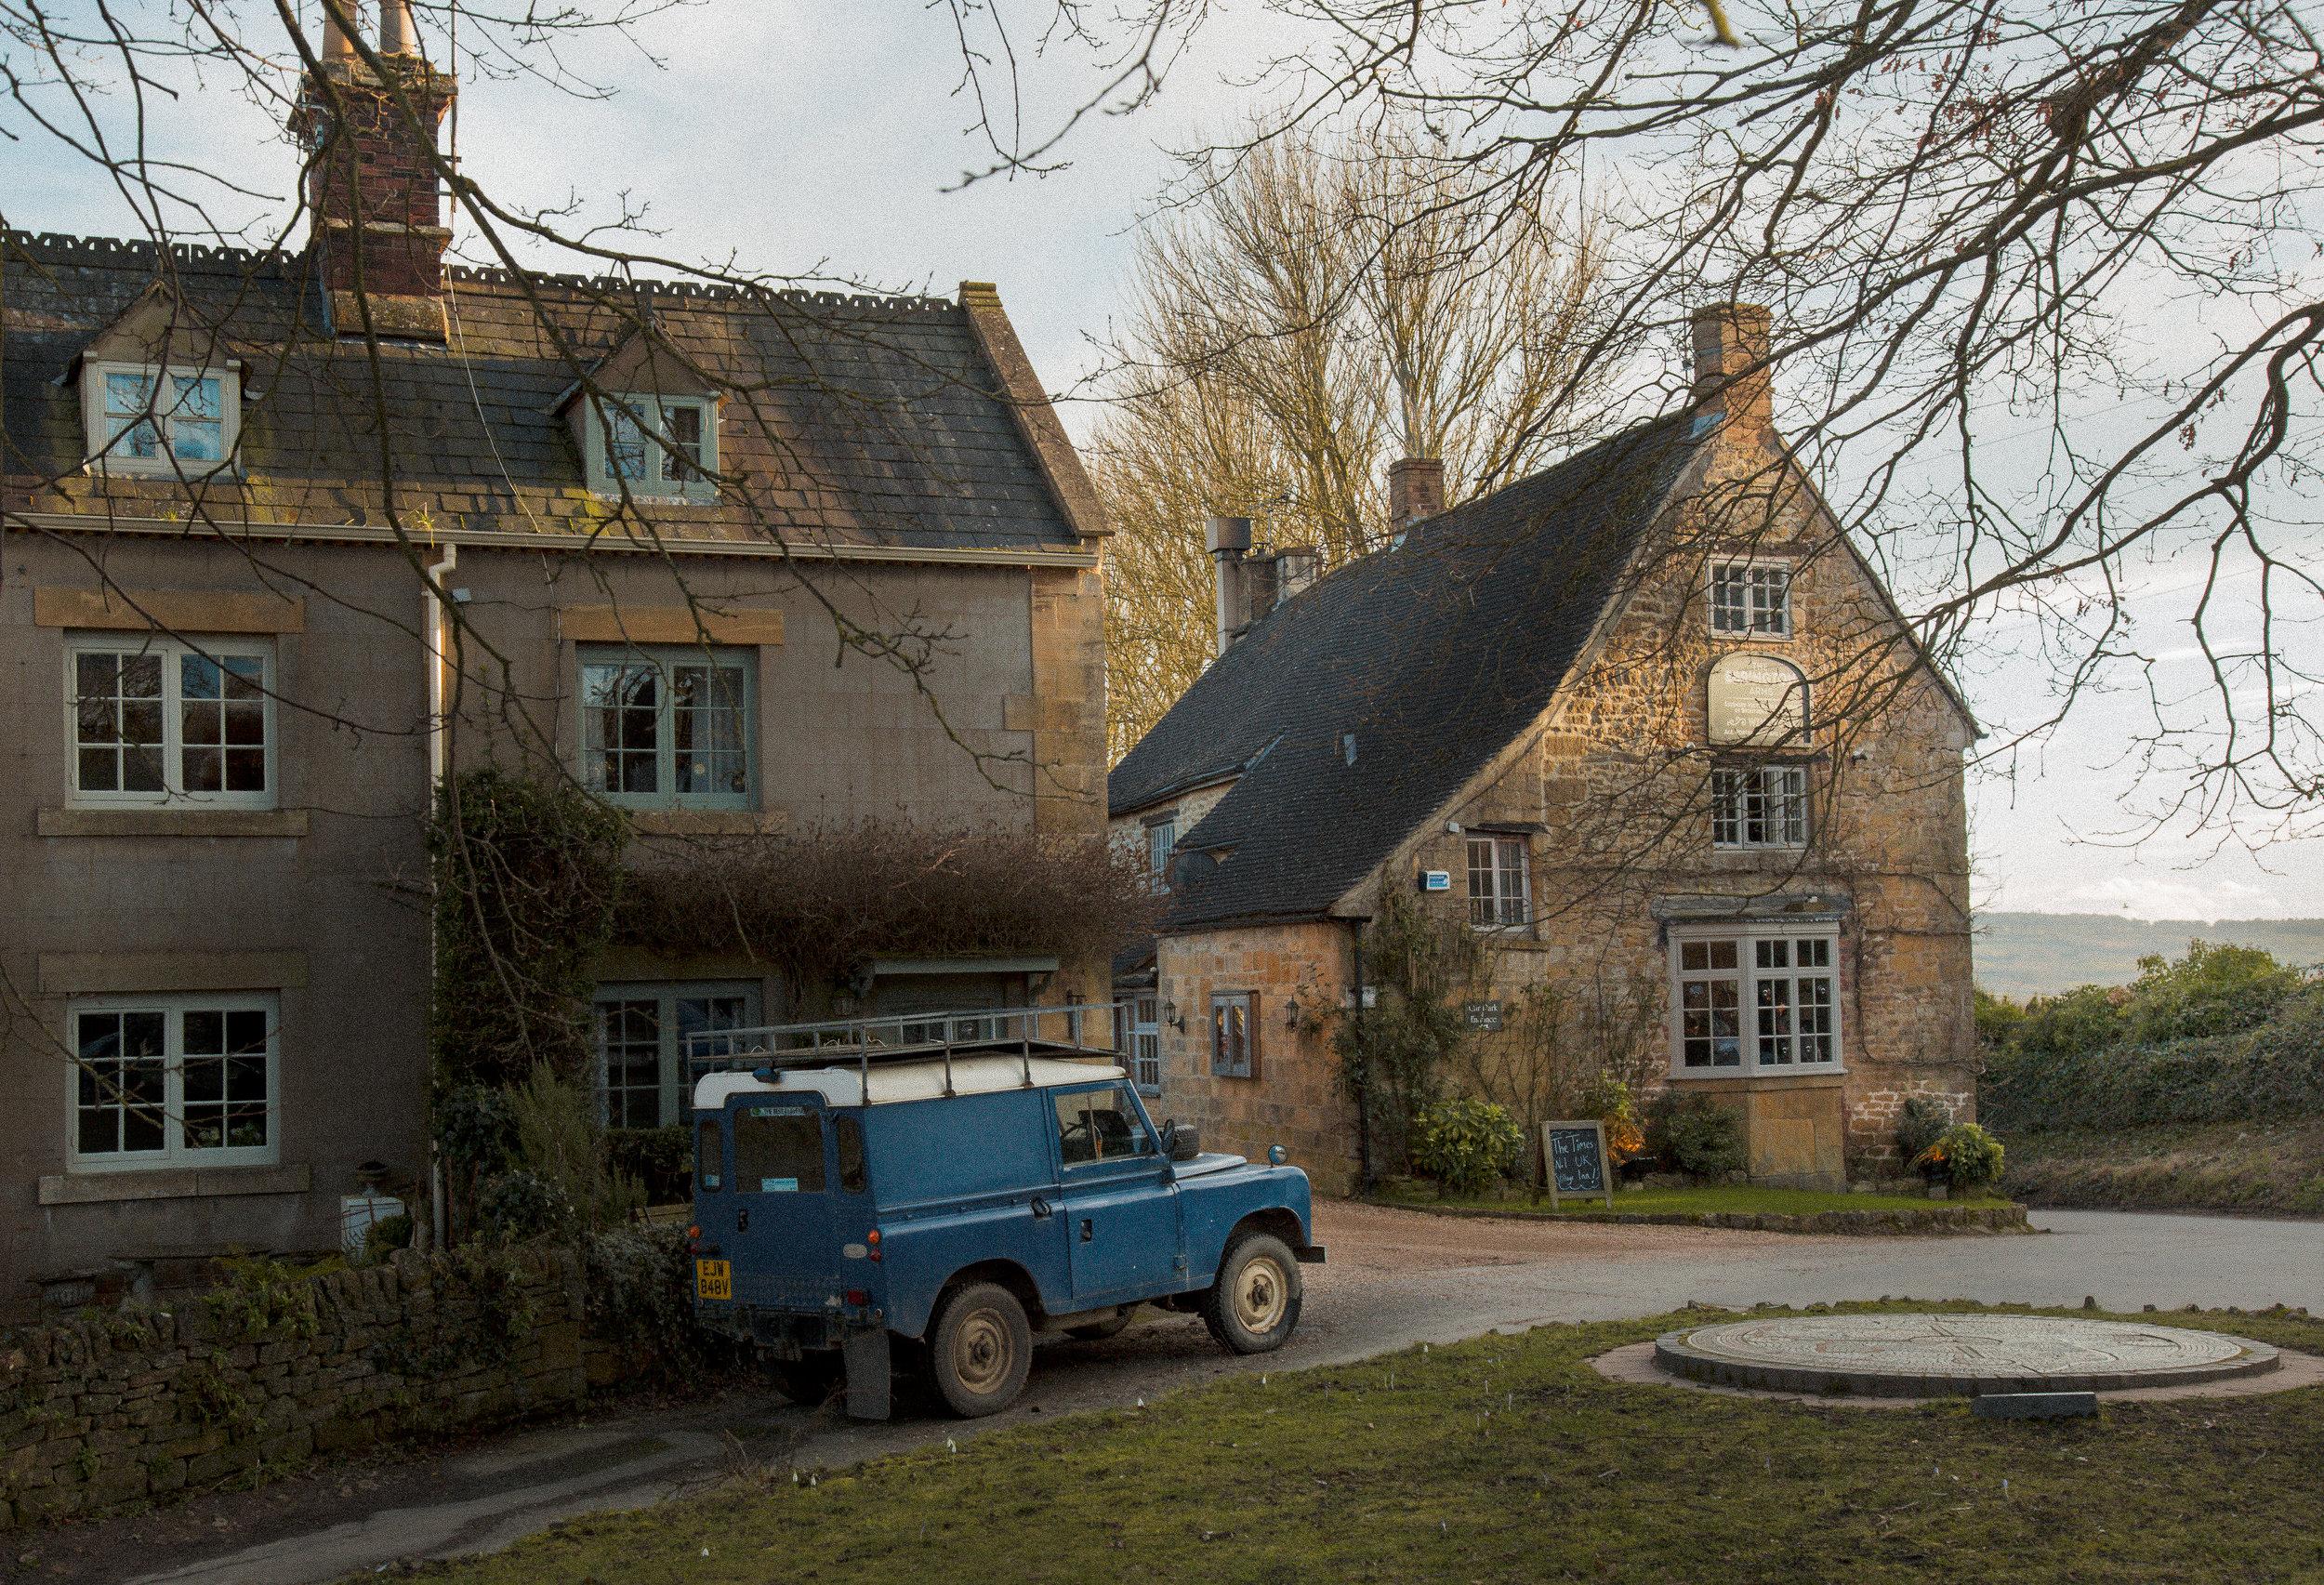 England Blue Car.jpg